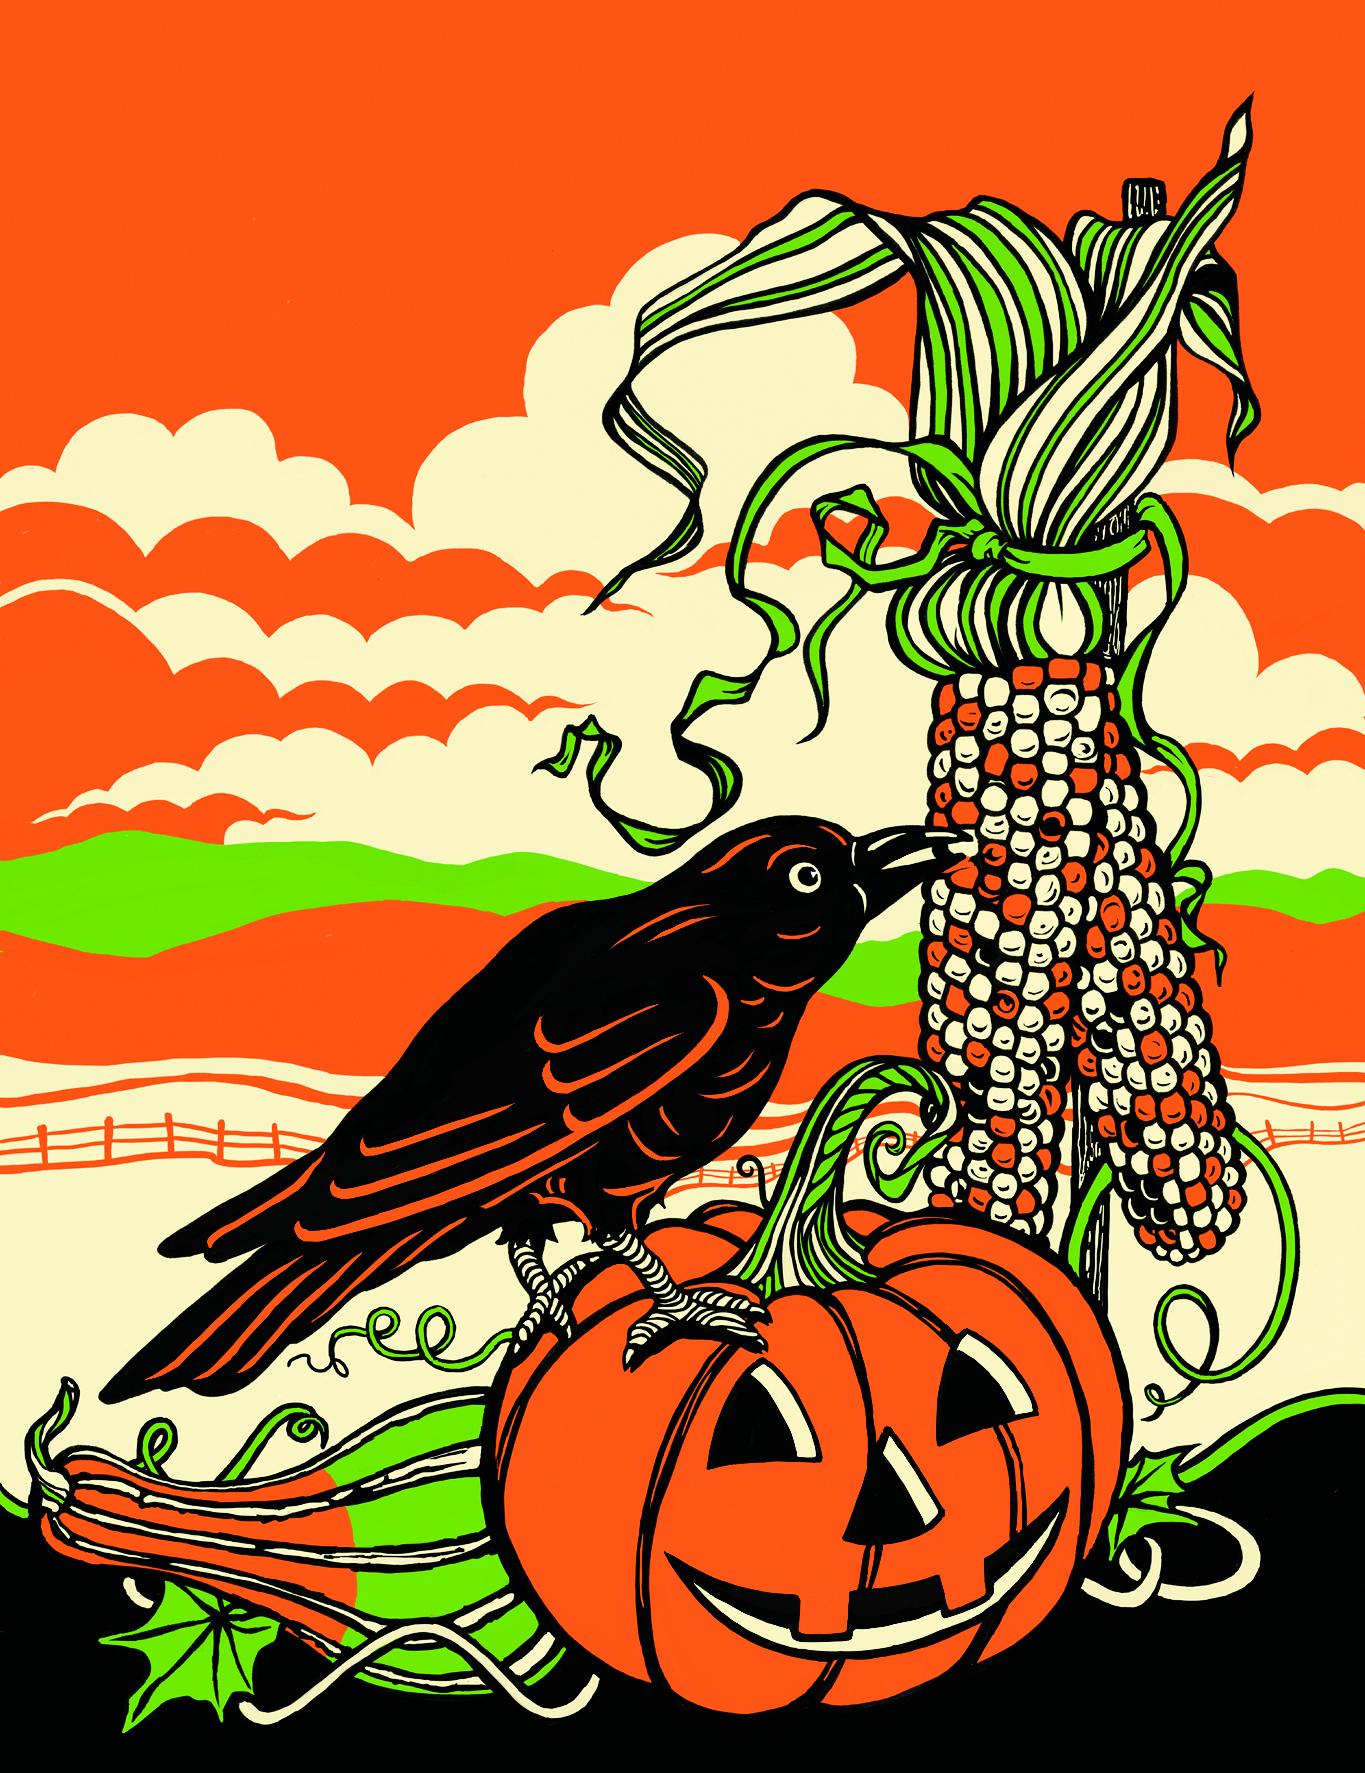 Fall_Crow_Pumpkin_new face_cover_ill.jpg